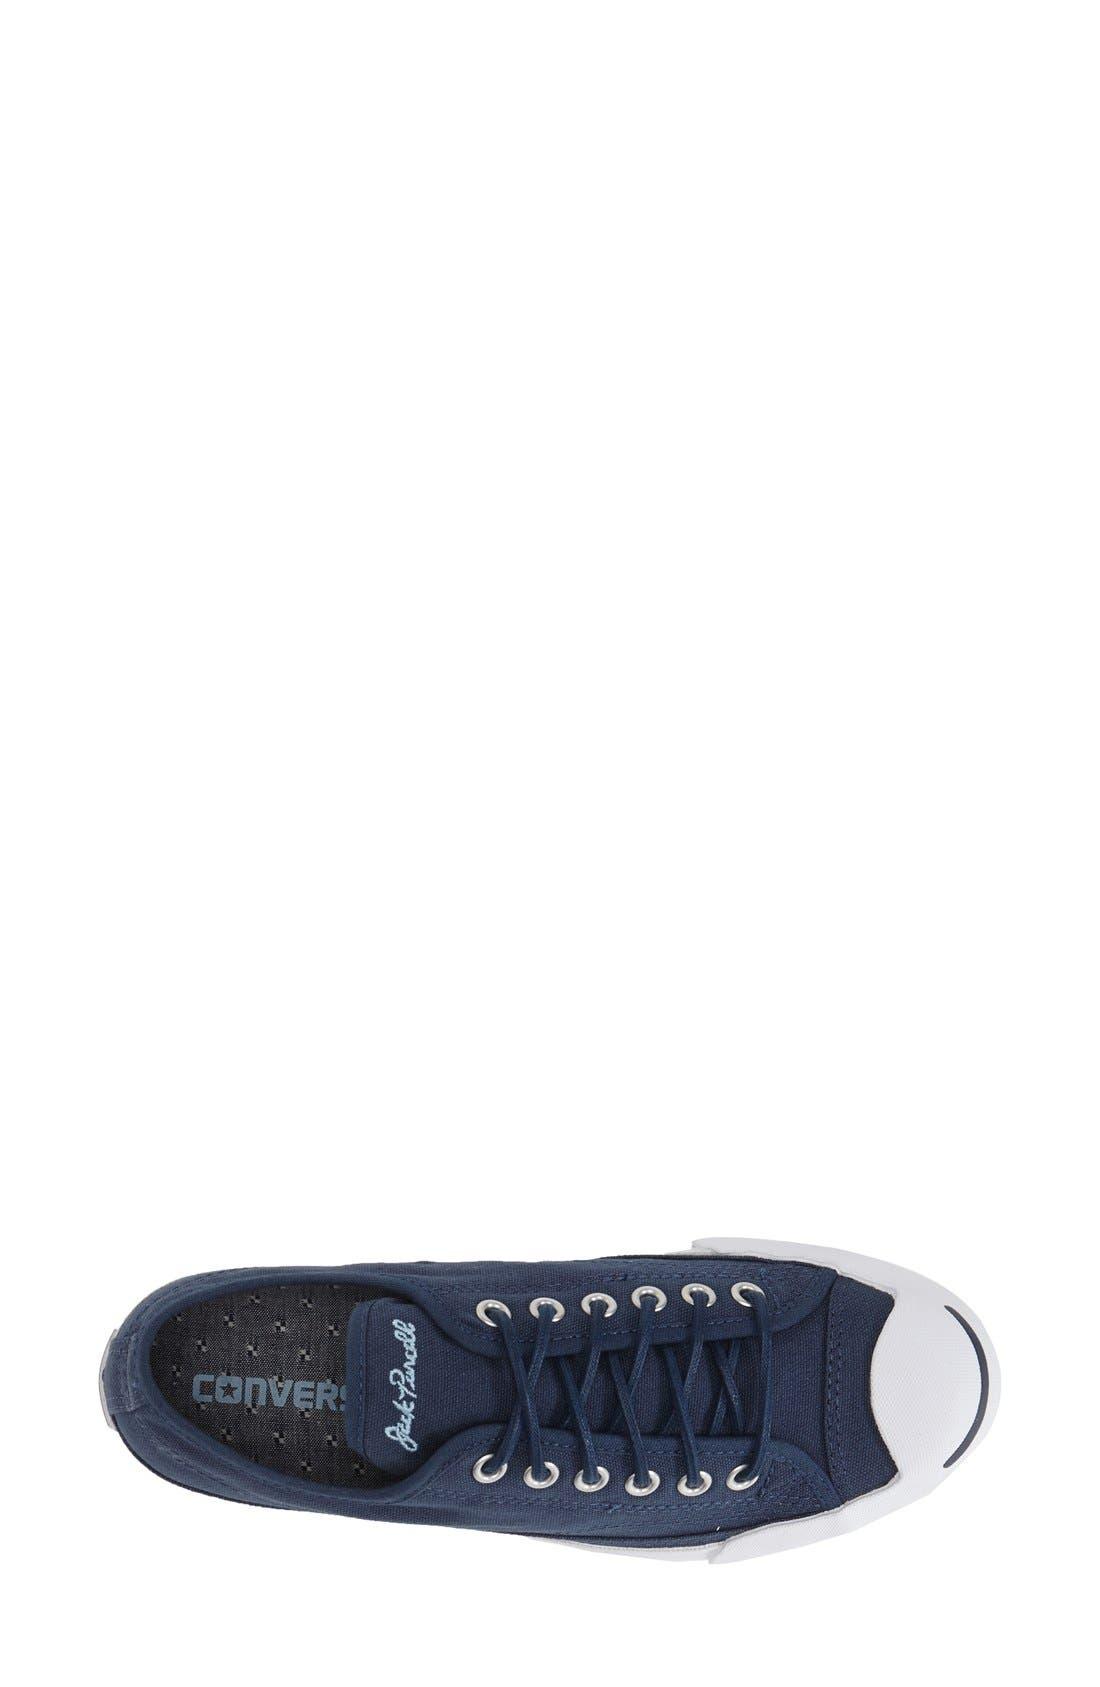 'Jack Purcell' Low Top Slip On Sneaker,                             Alternate thumbnail 3, color,                             Navy/ Blue/ White